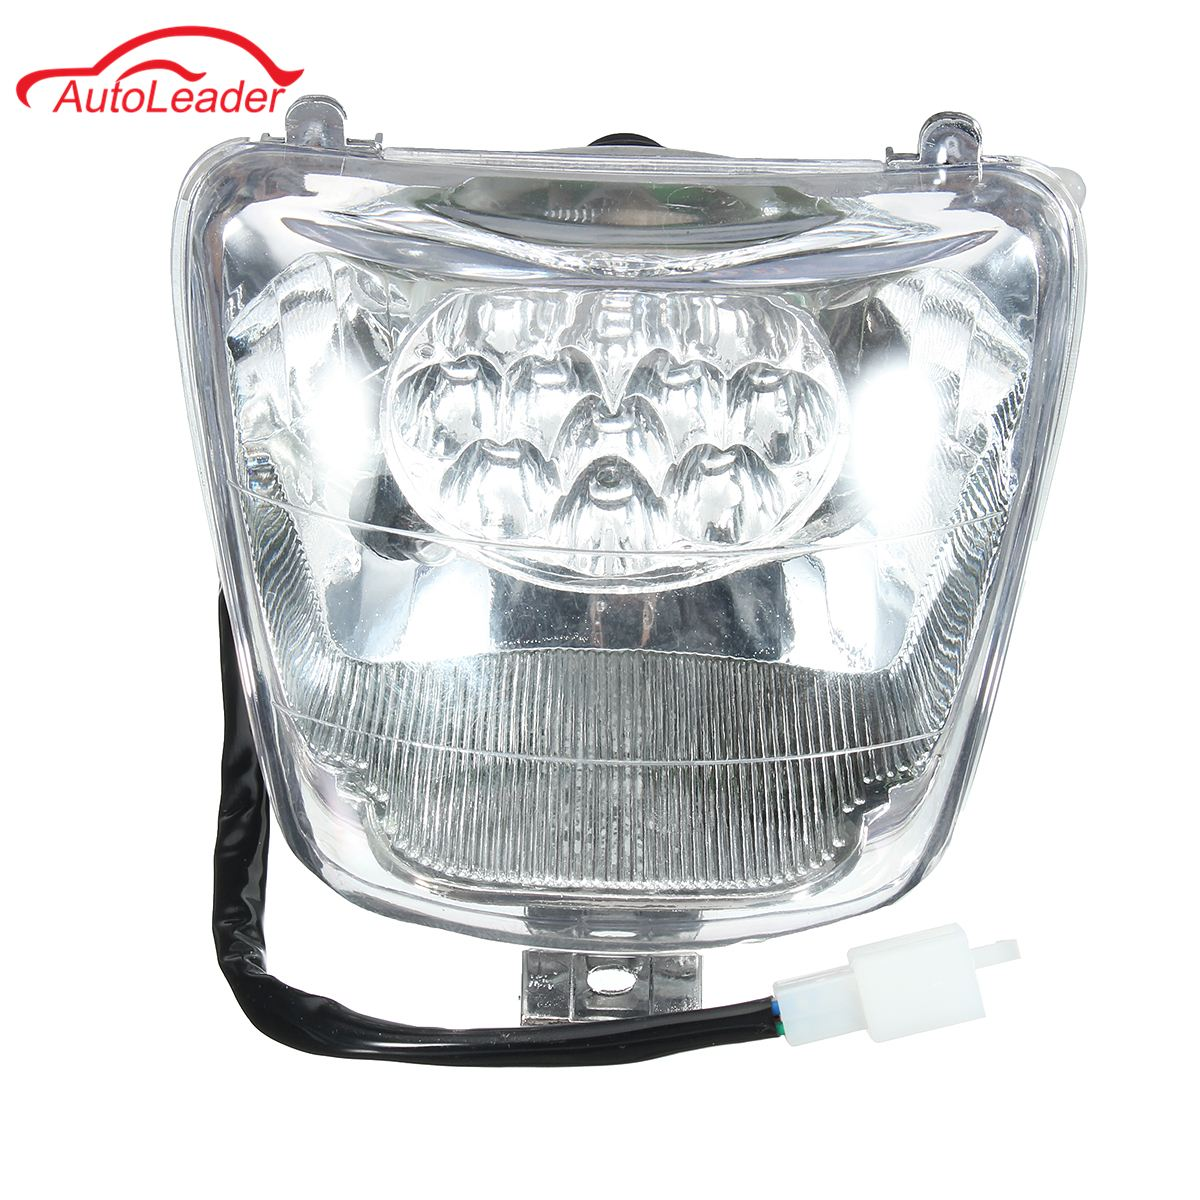 HEADLIGHT spot light 5 WIRE ATV 110CC 125CC 150CC 250cc ATV Taotao bulb included